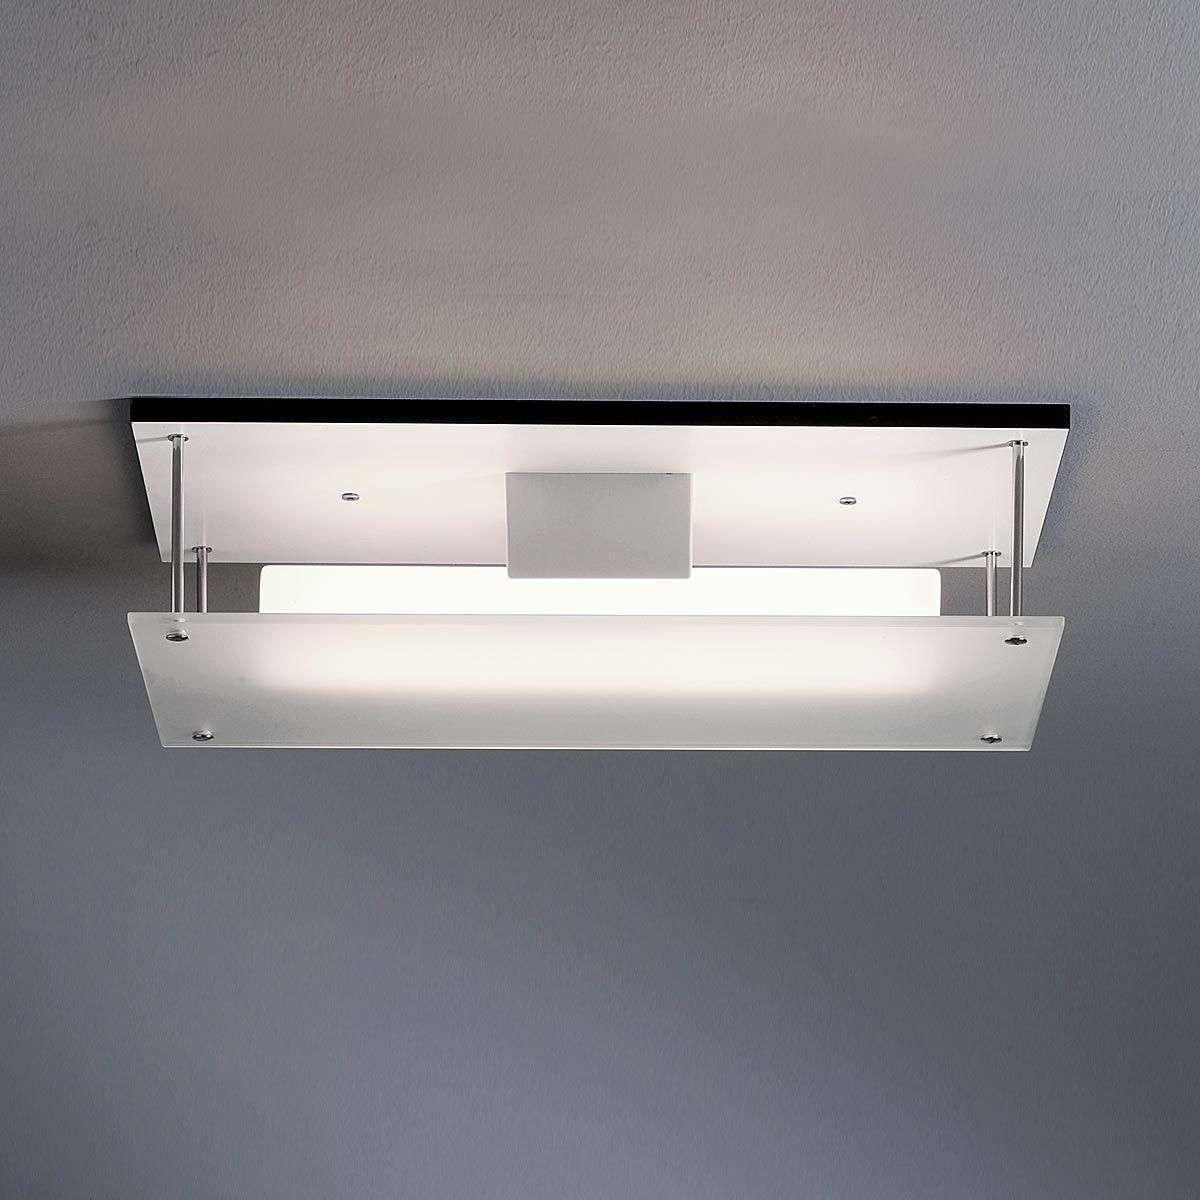 German Art Deco Ceiling Light 9030080 31